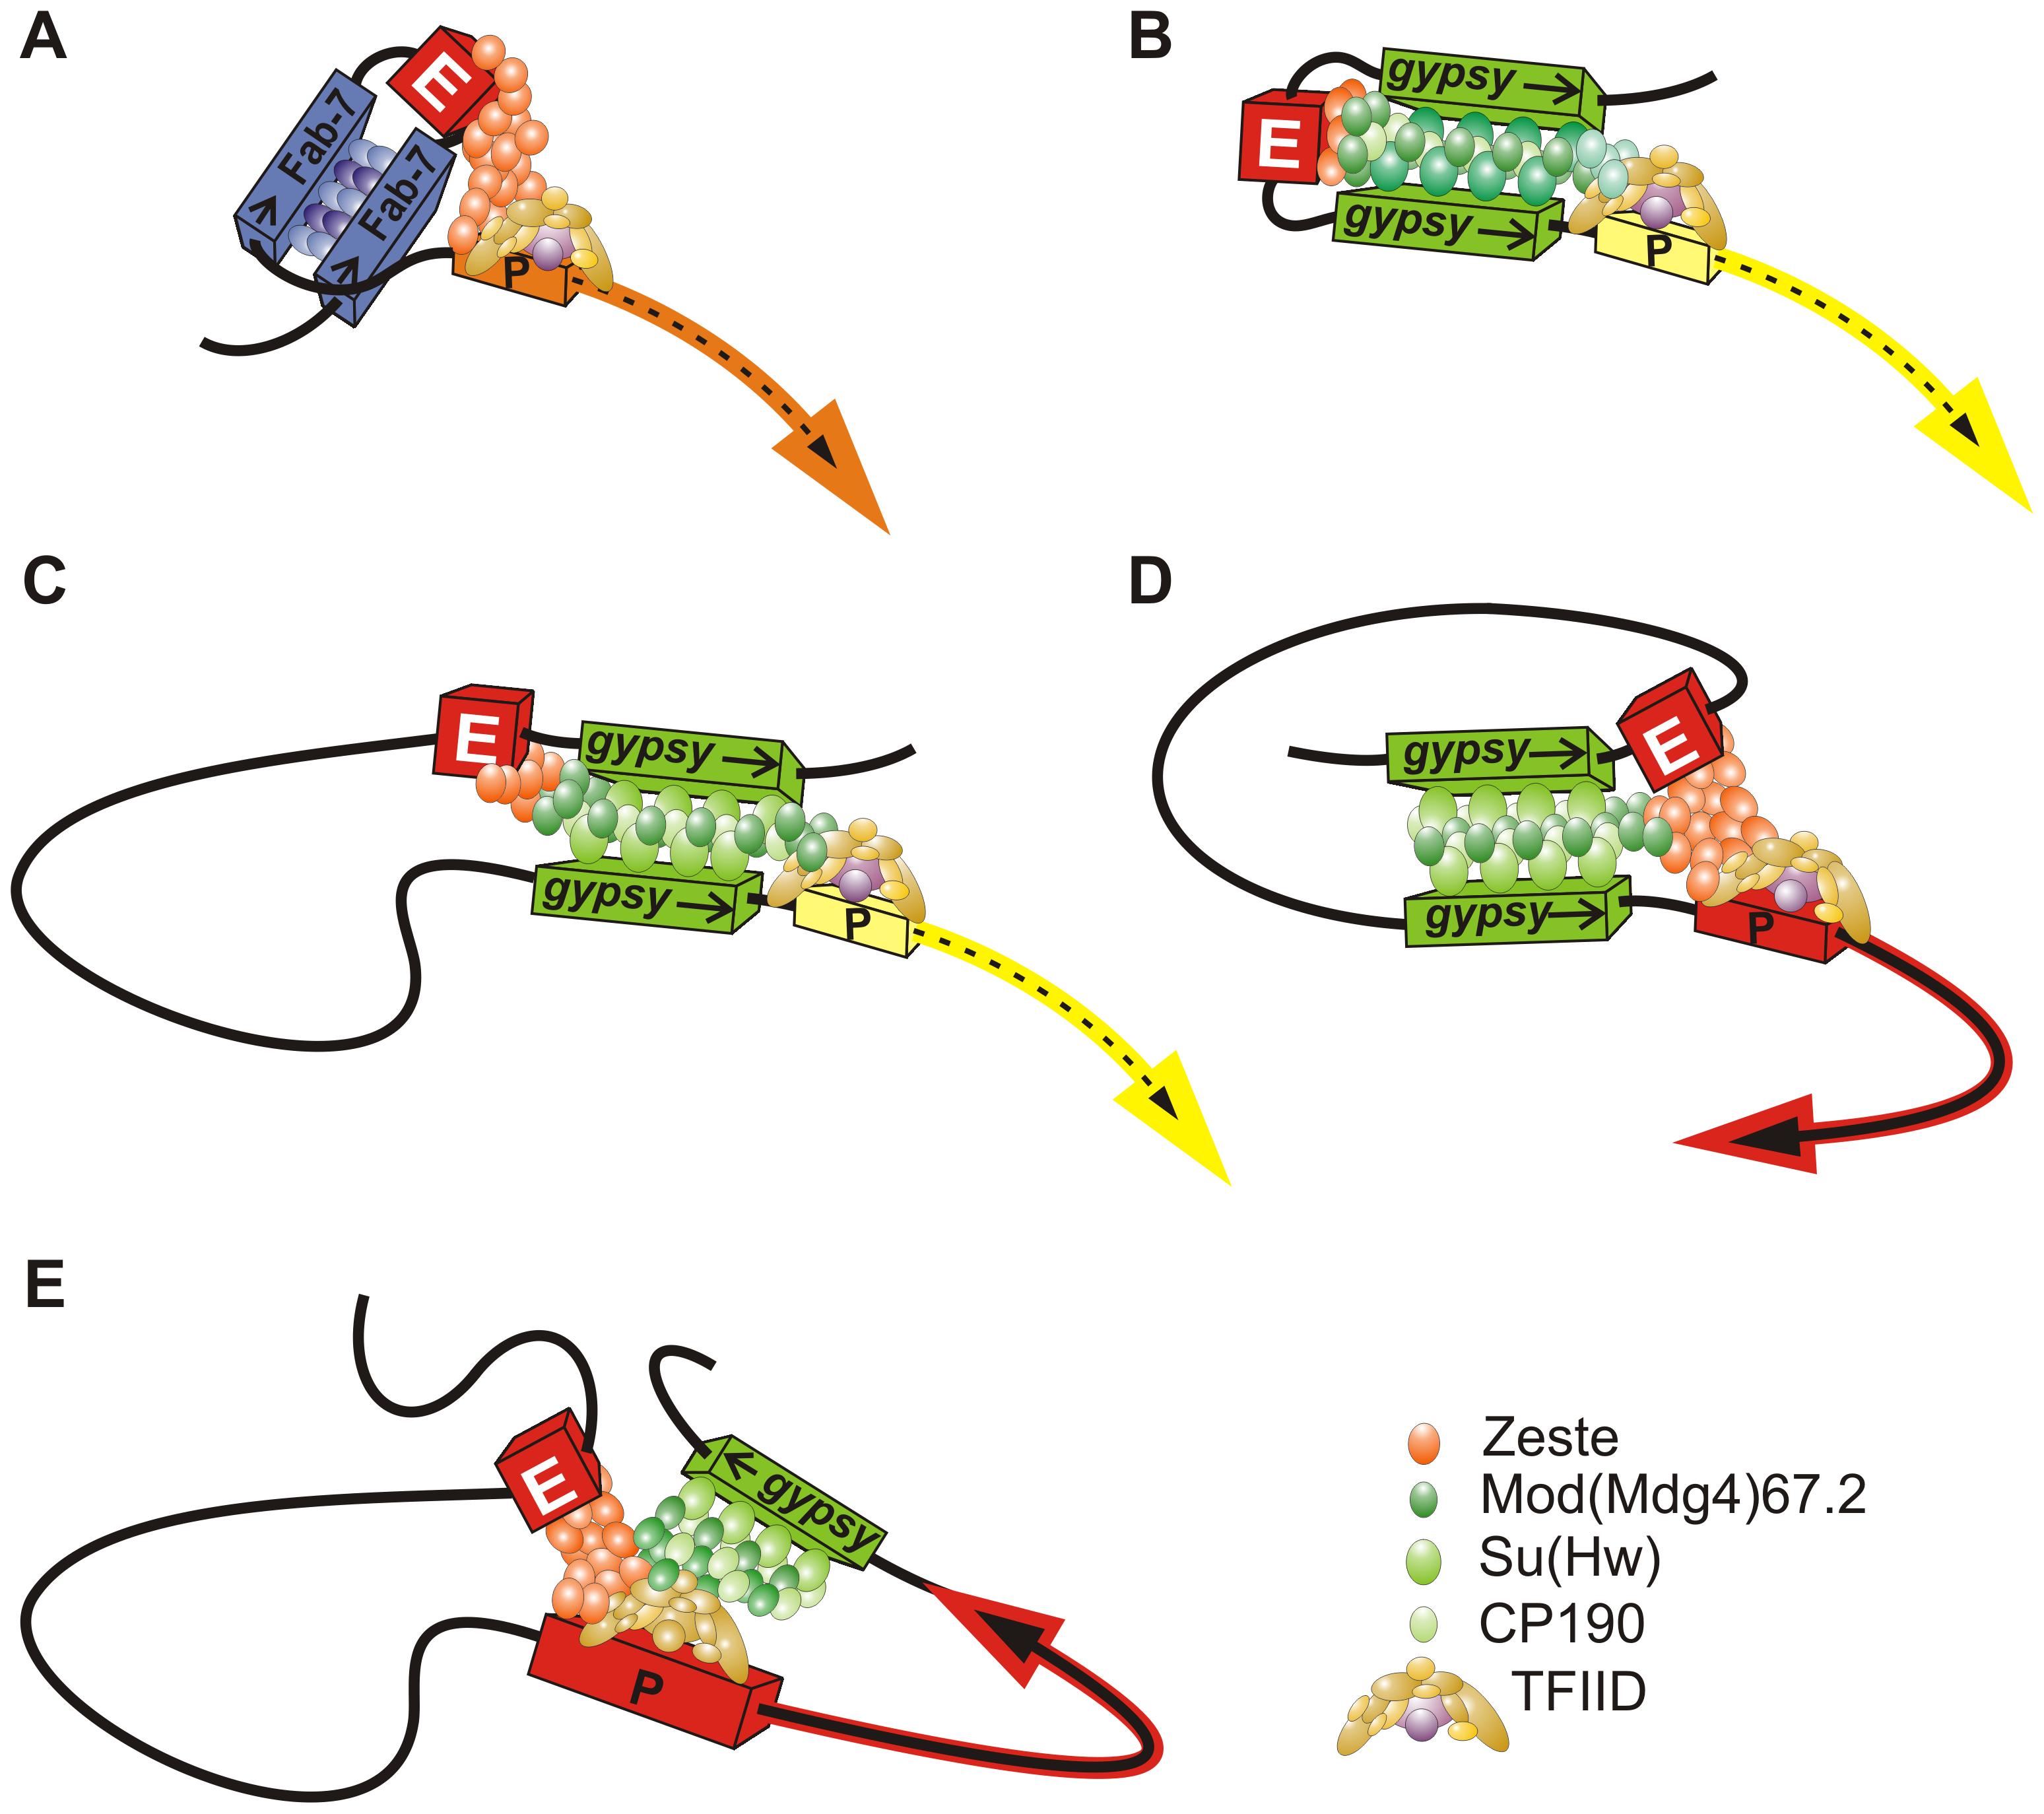 Model describing the mechanisms of enhancer blocking by the <i>gypsy</i> insulator.